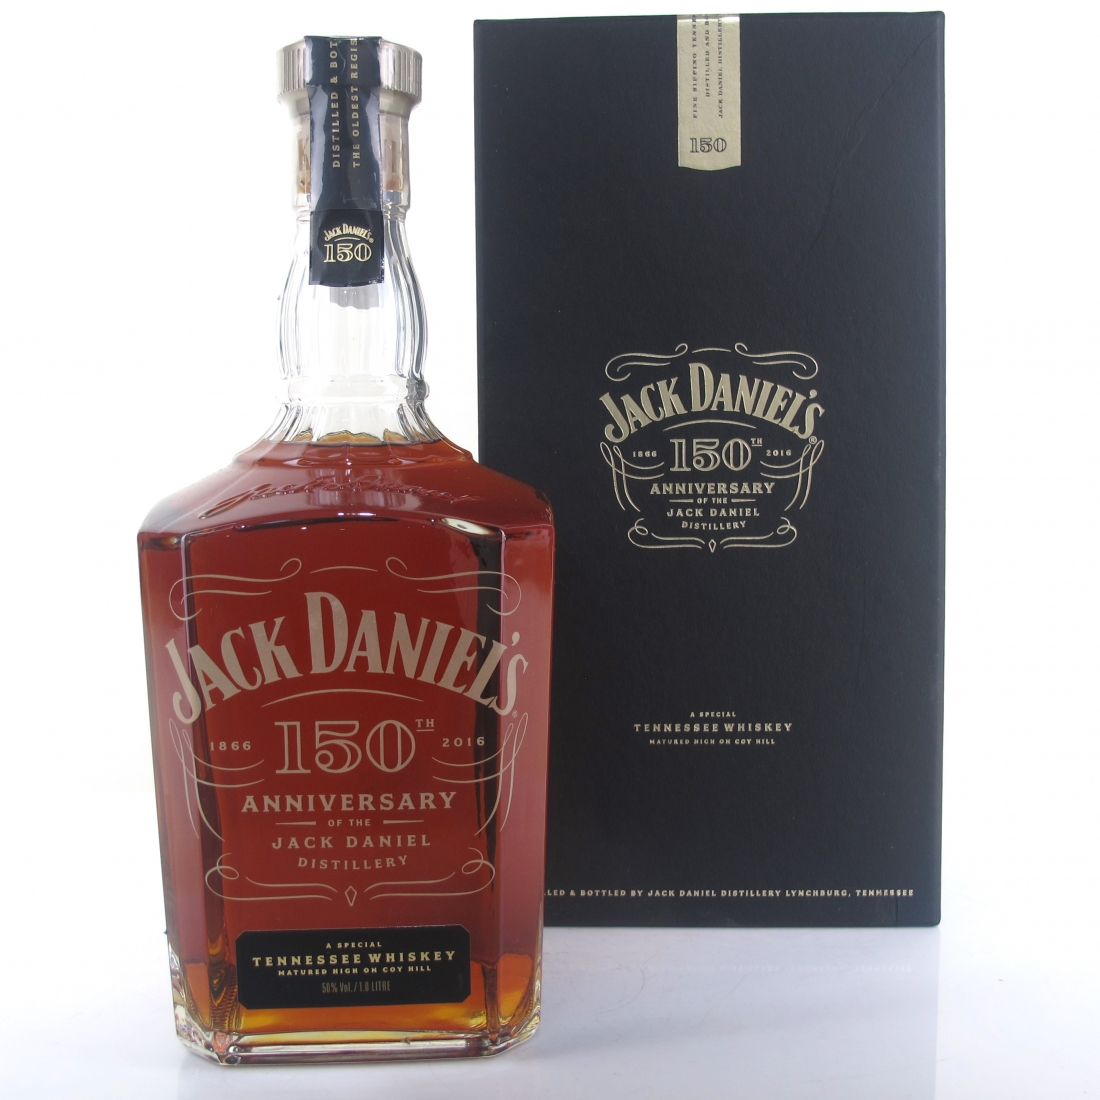 Jack Daniel's 150th Anniversary Cask Strength 1 Litre